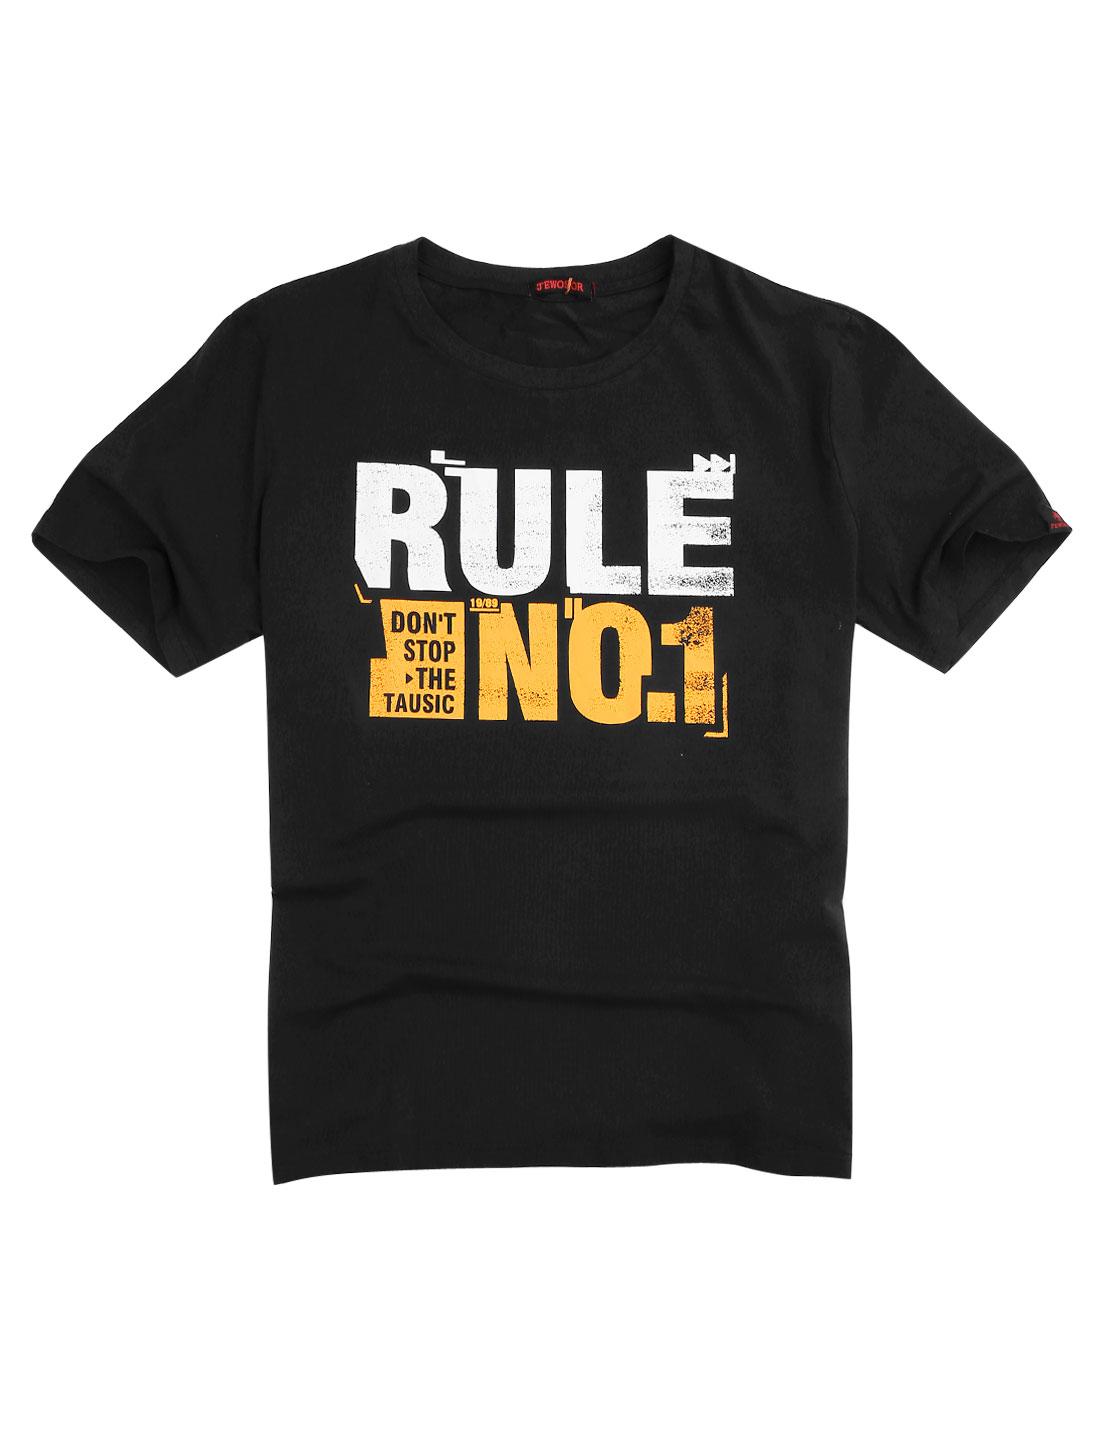 Men Pullover Round Neck Leisure Big-Tall Soft T-shirt Black 2X Big